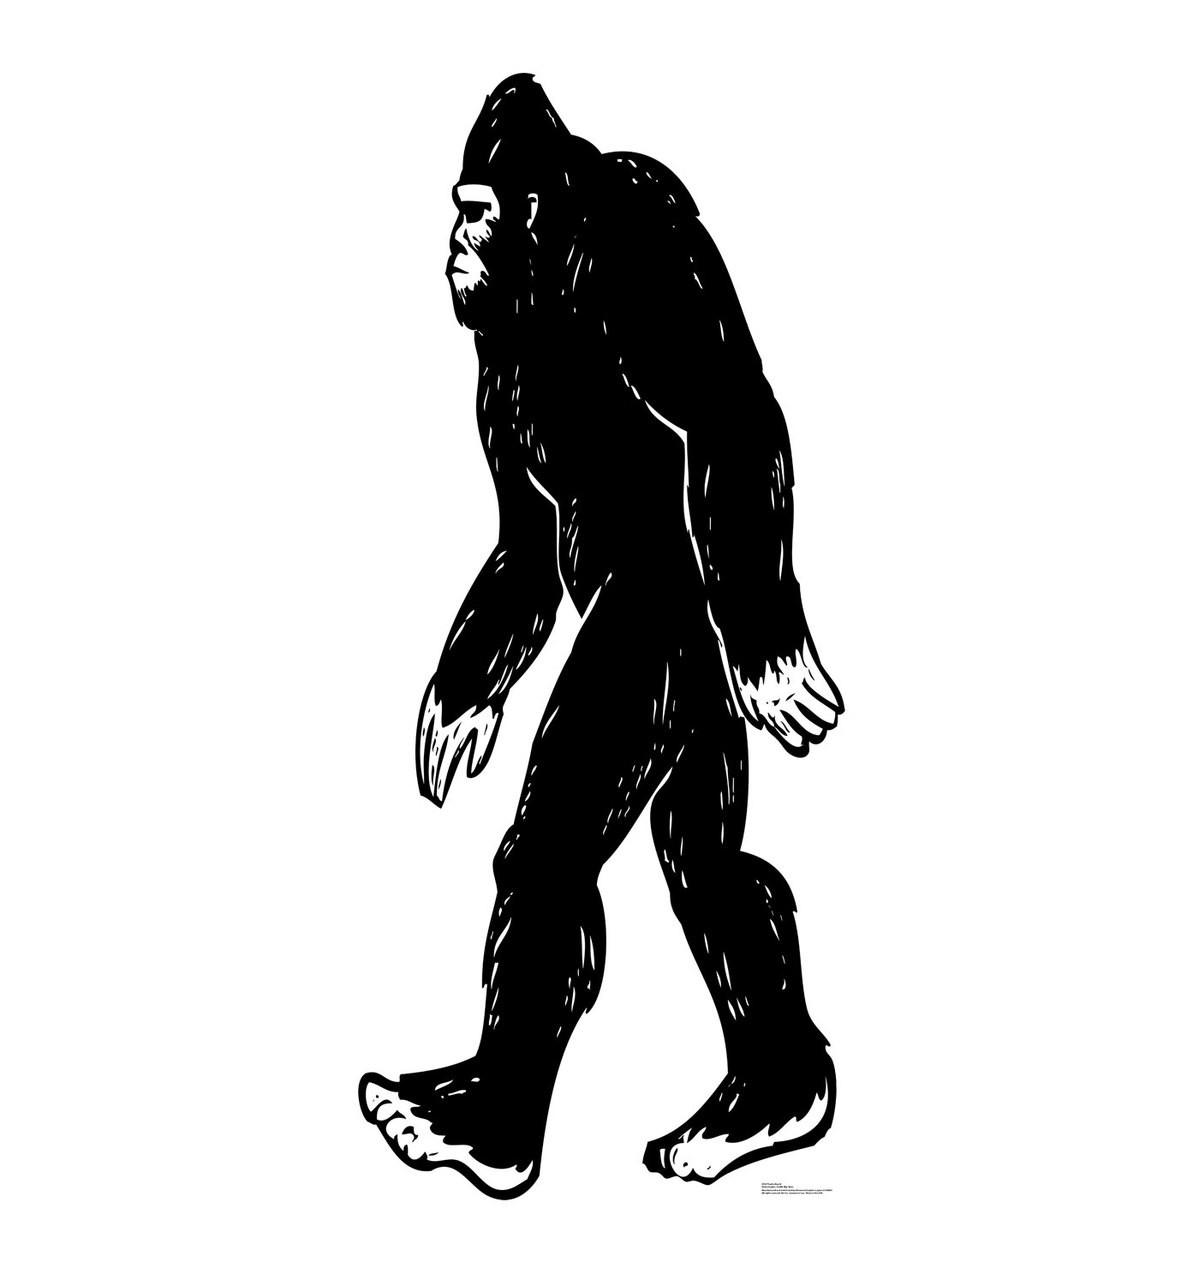 Bigfoot-Cardboard Cutout 2522